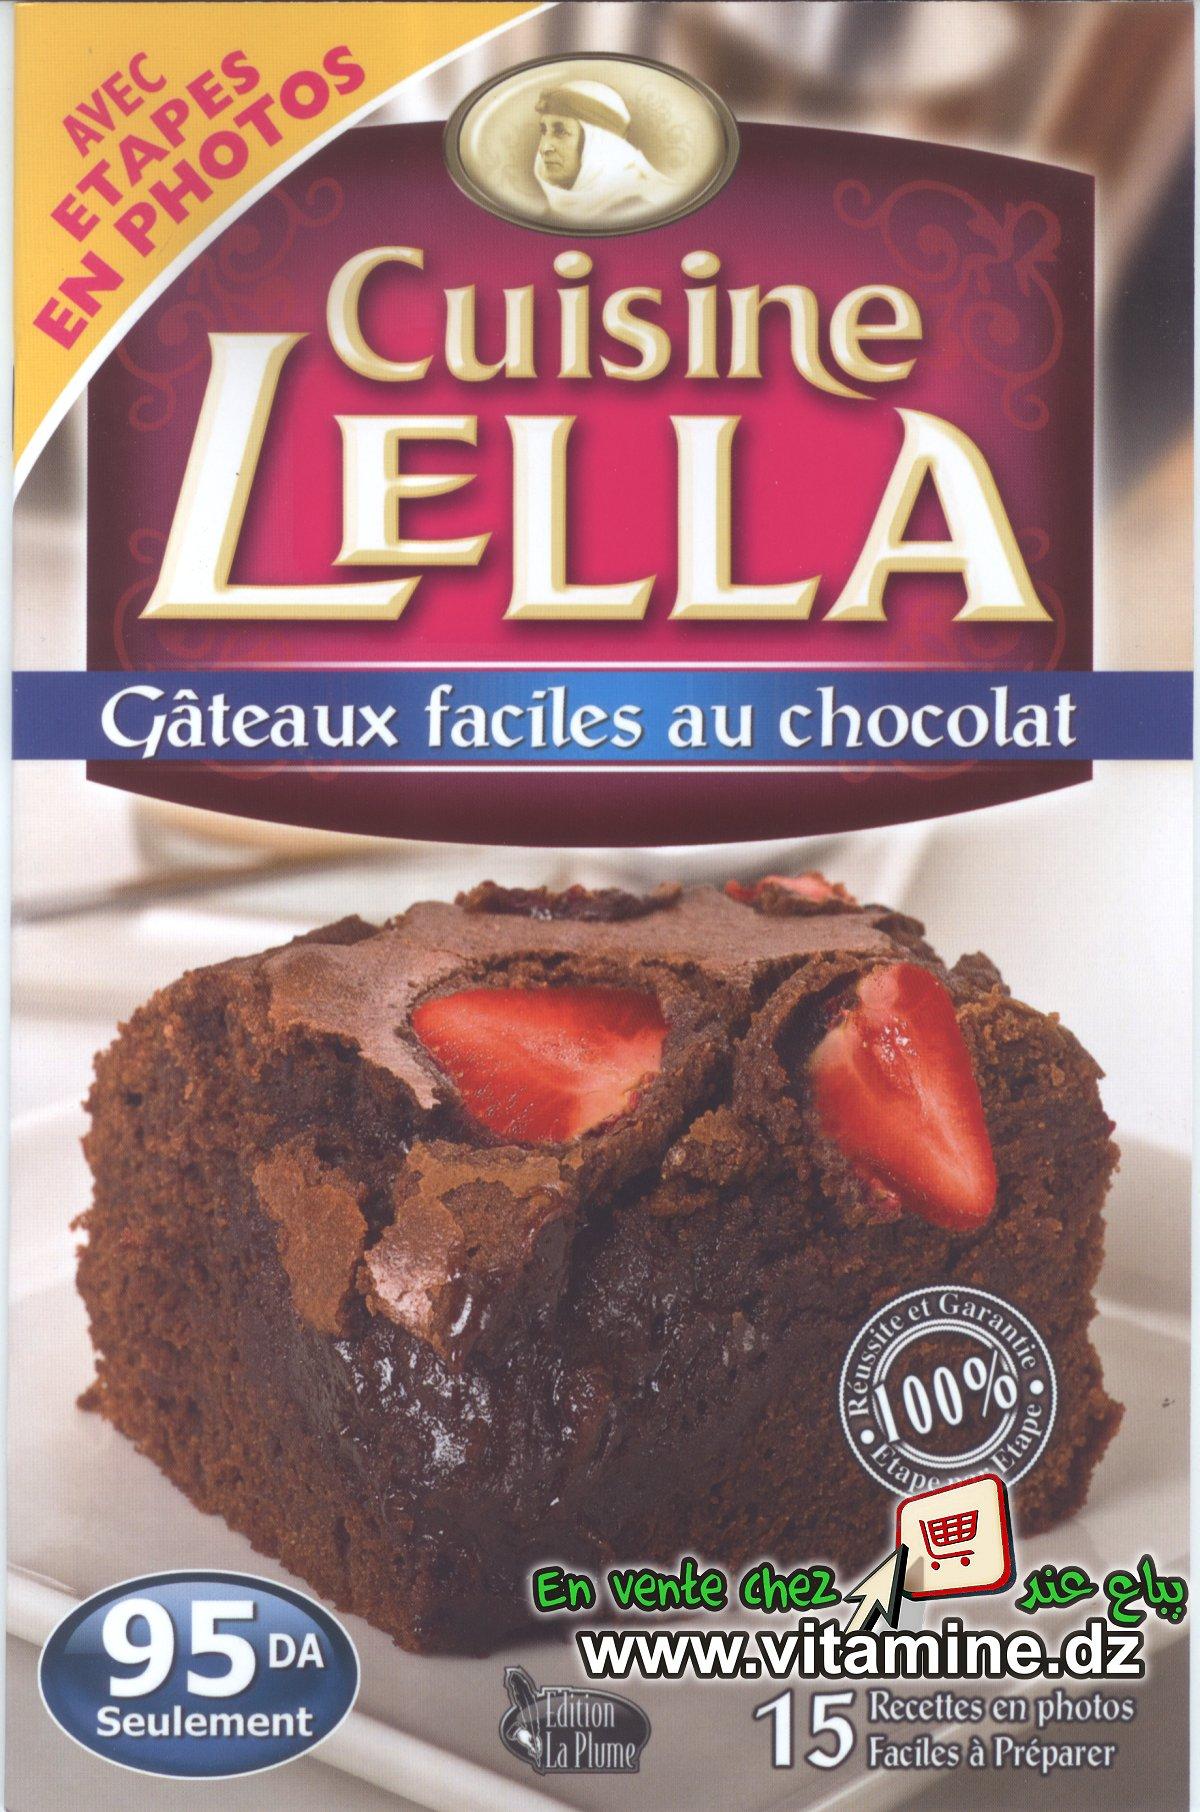 Cuisine Lella - Gâteaux faciles au chocolat